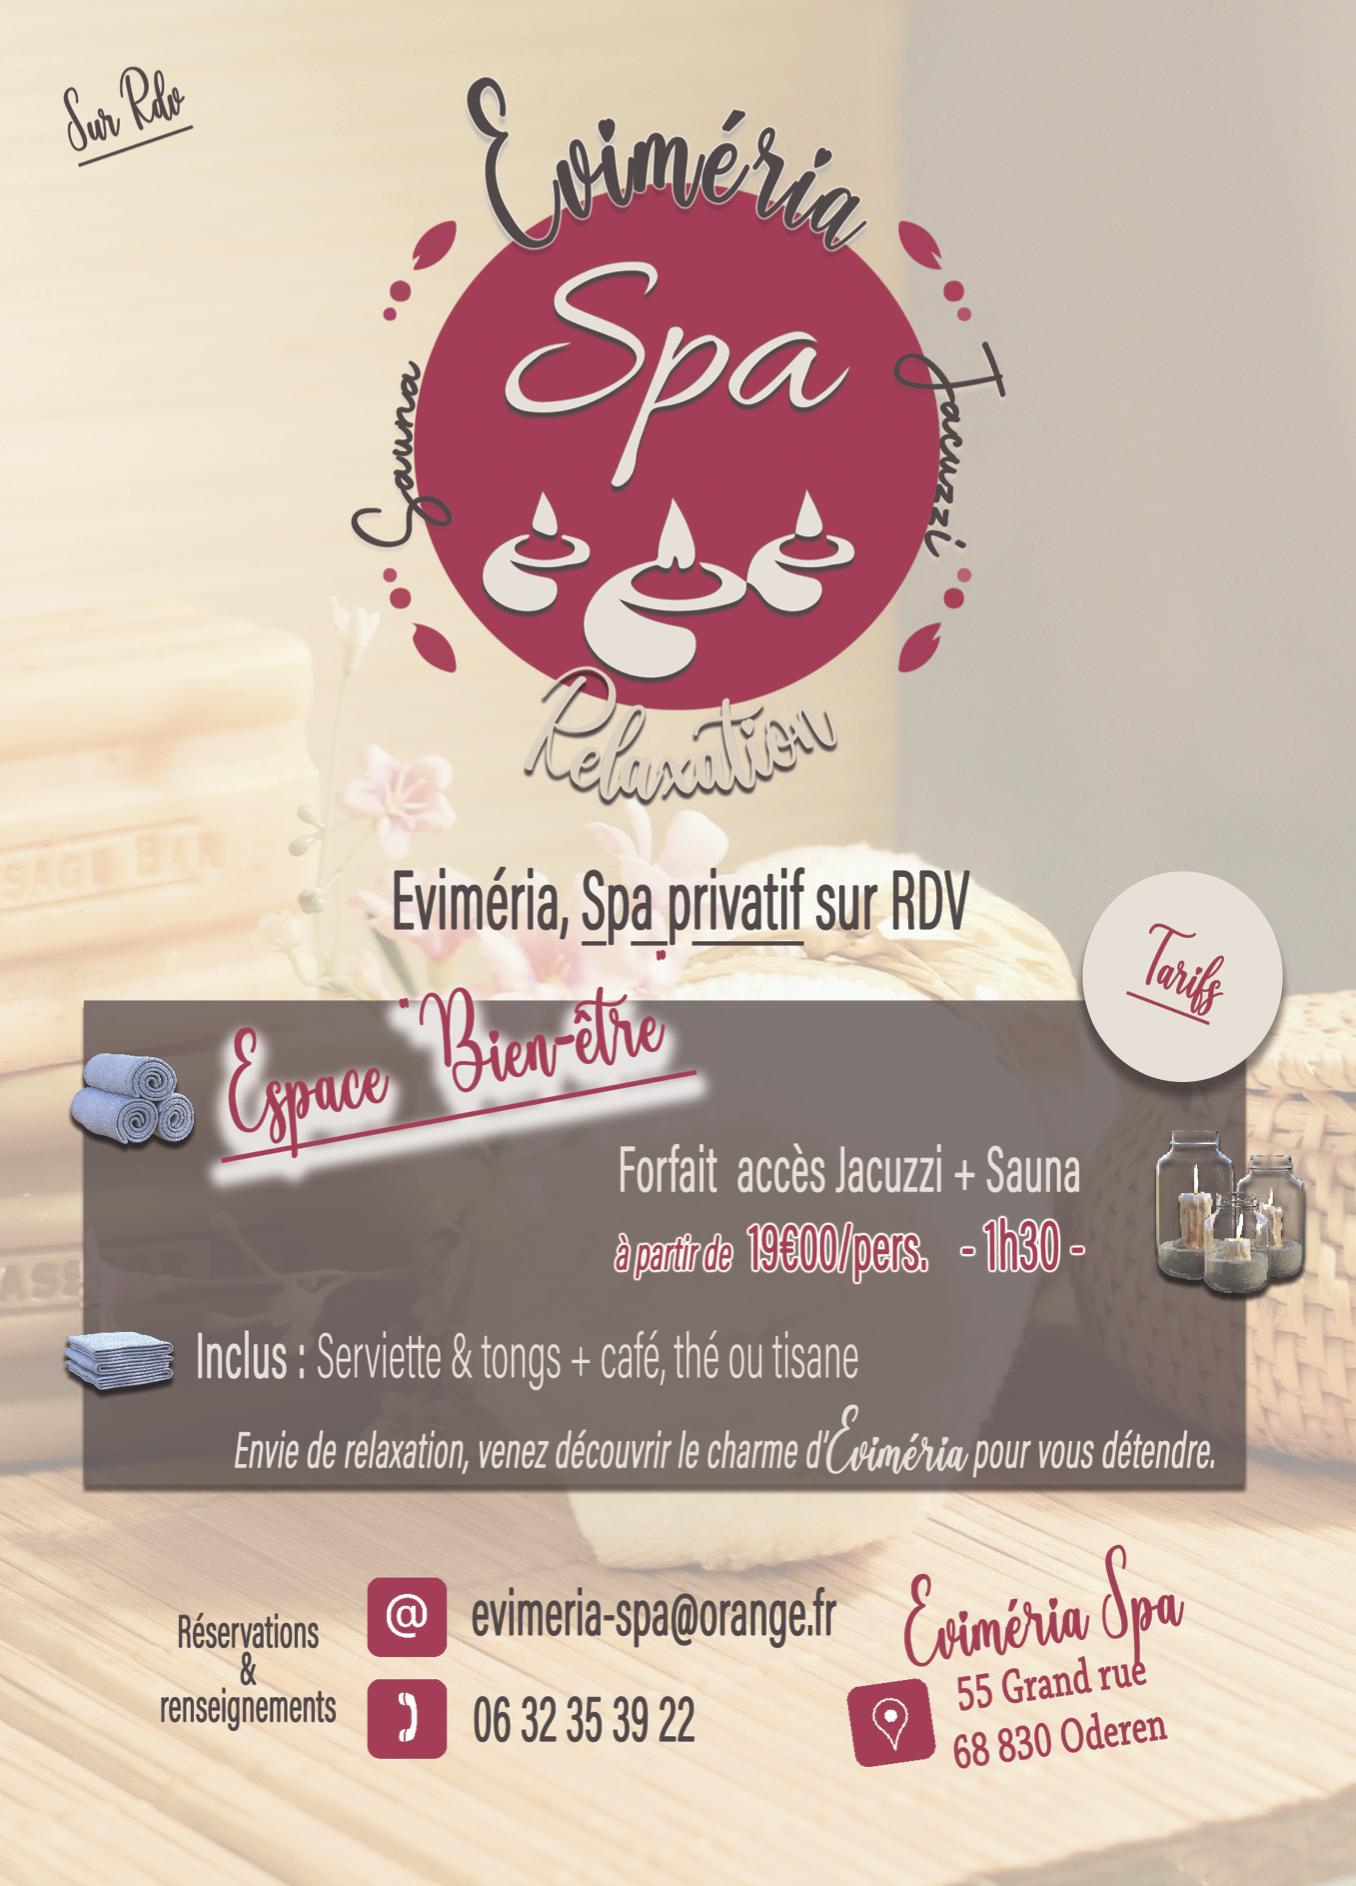 Evimeria Spa Oderen, jacuzzi, sauna, relaxation